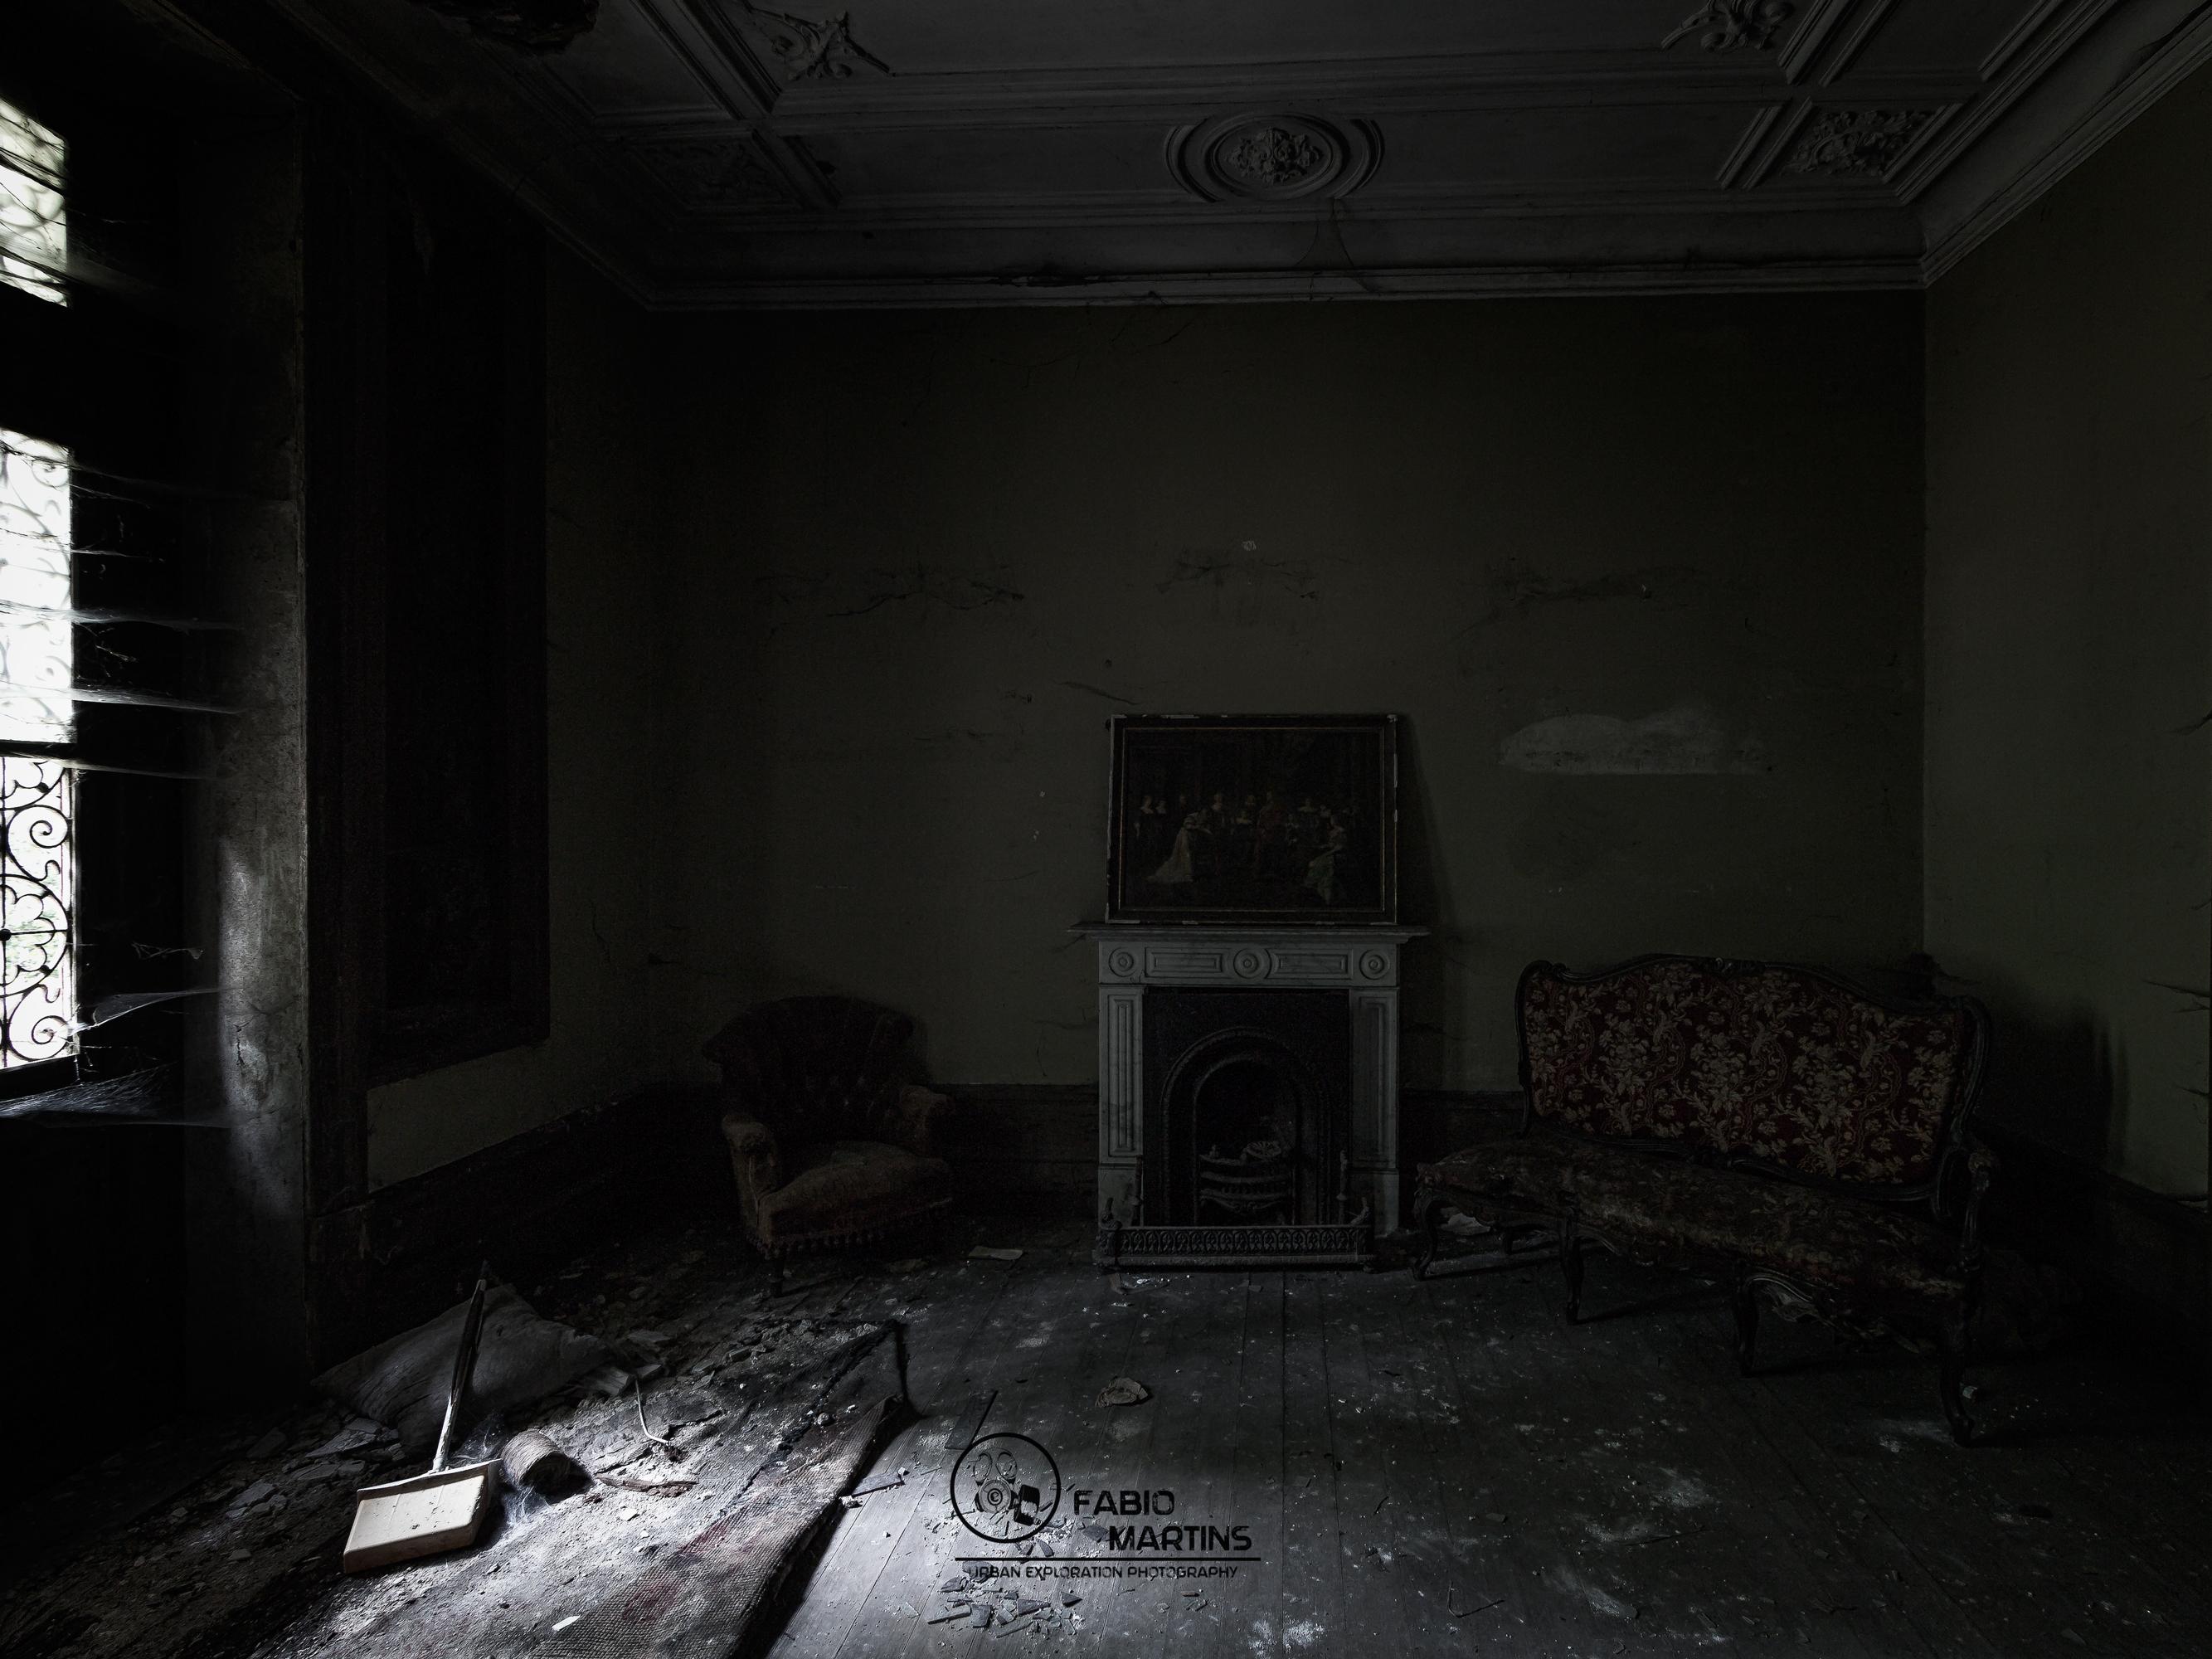 Fondos de pantalla : pintura, ventana, urbano, abandonado, sombra ...